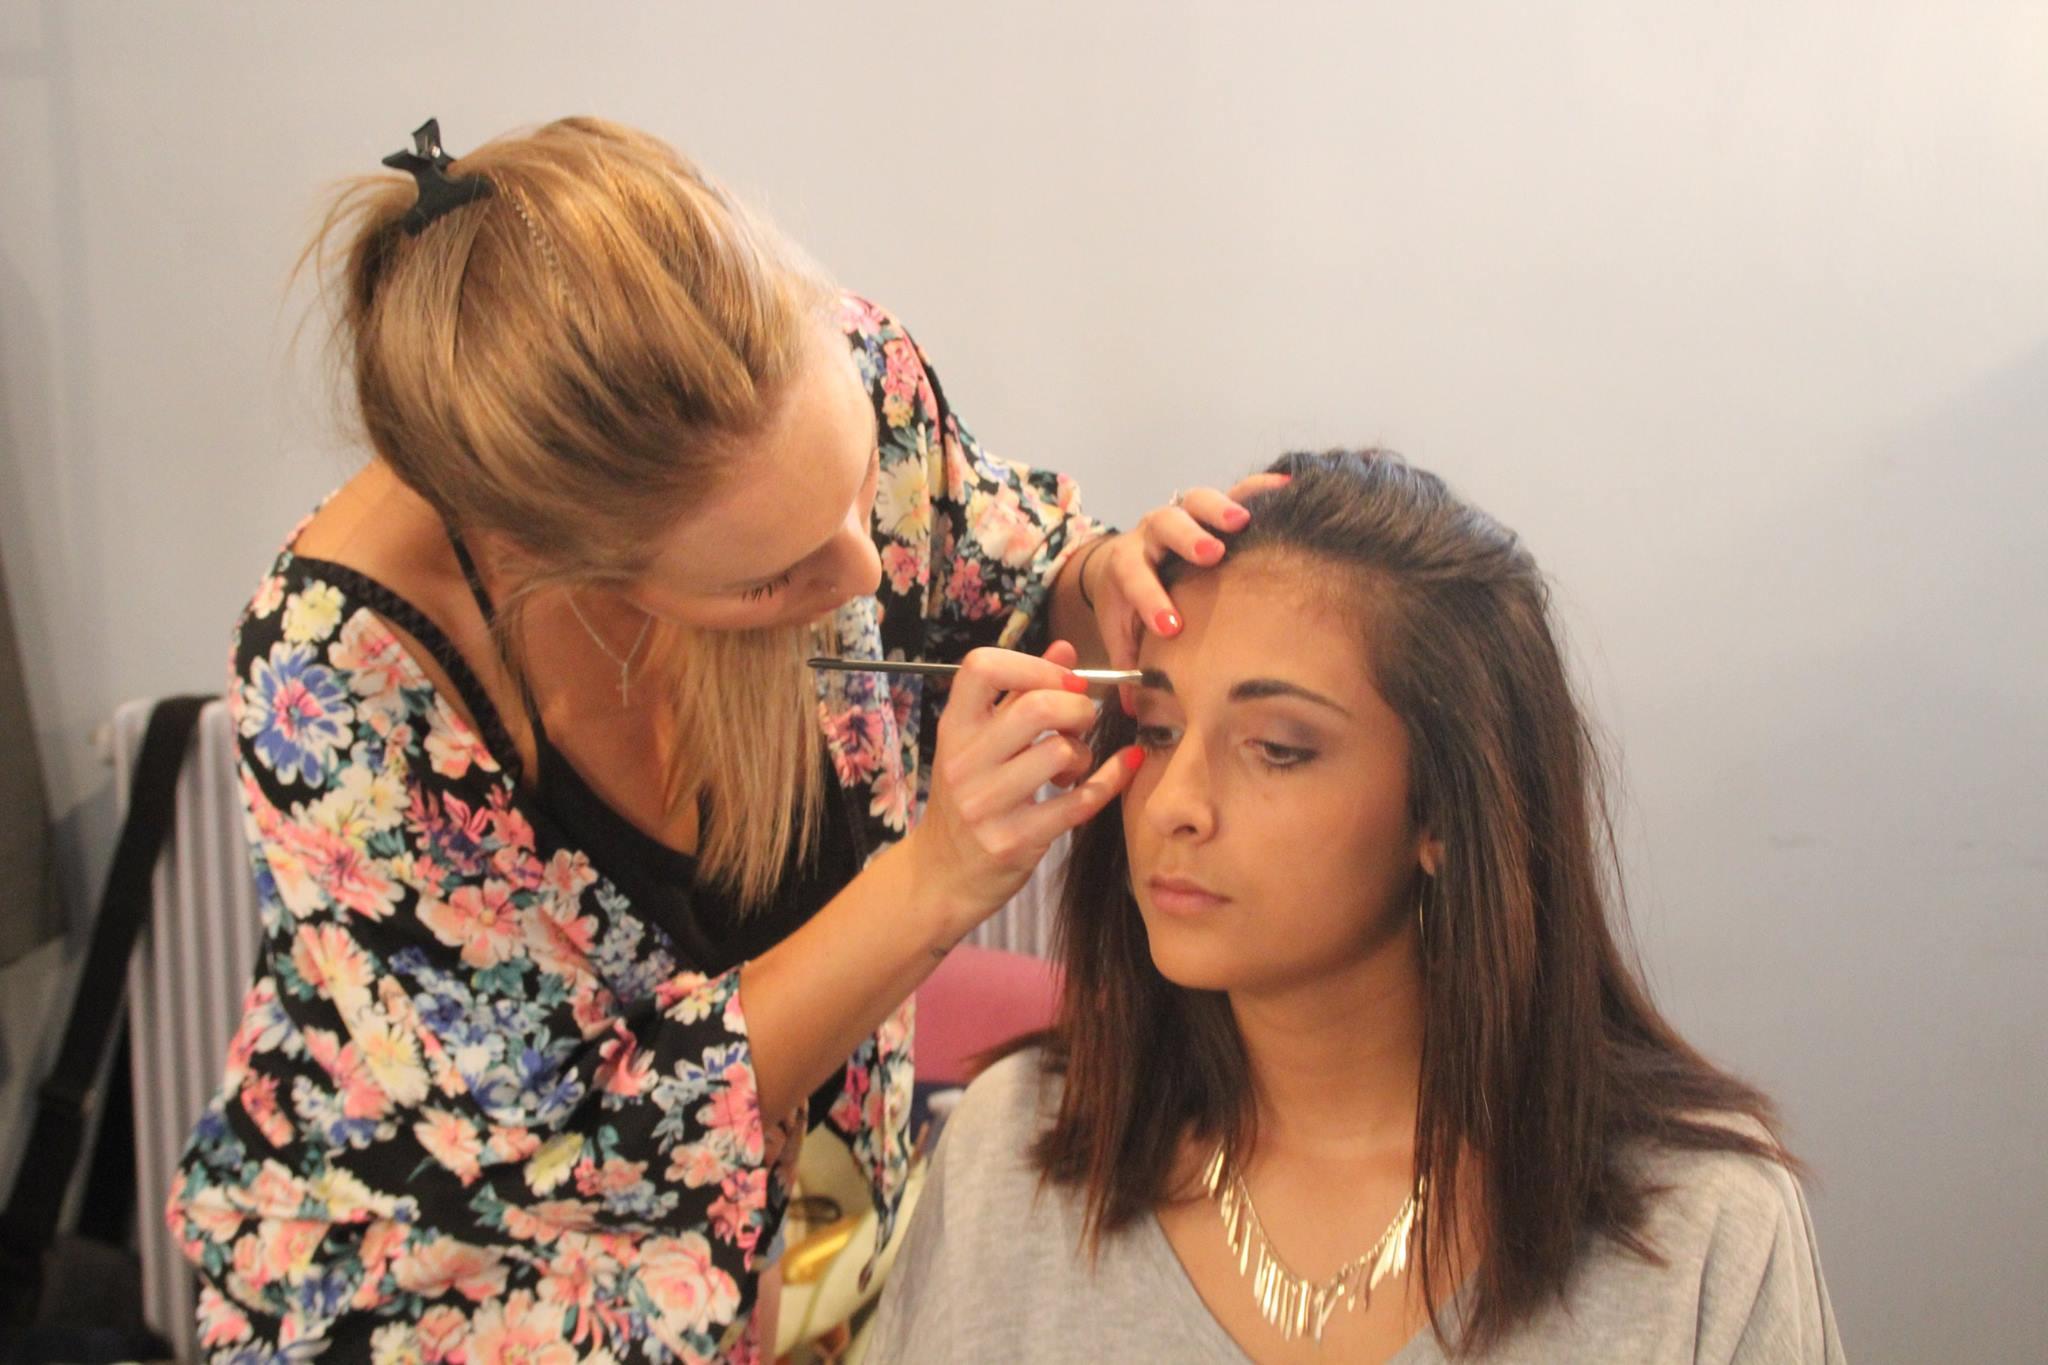 11721028 844848415591357 886644232 o mon beau miroir for Miroir coiffure st augustin